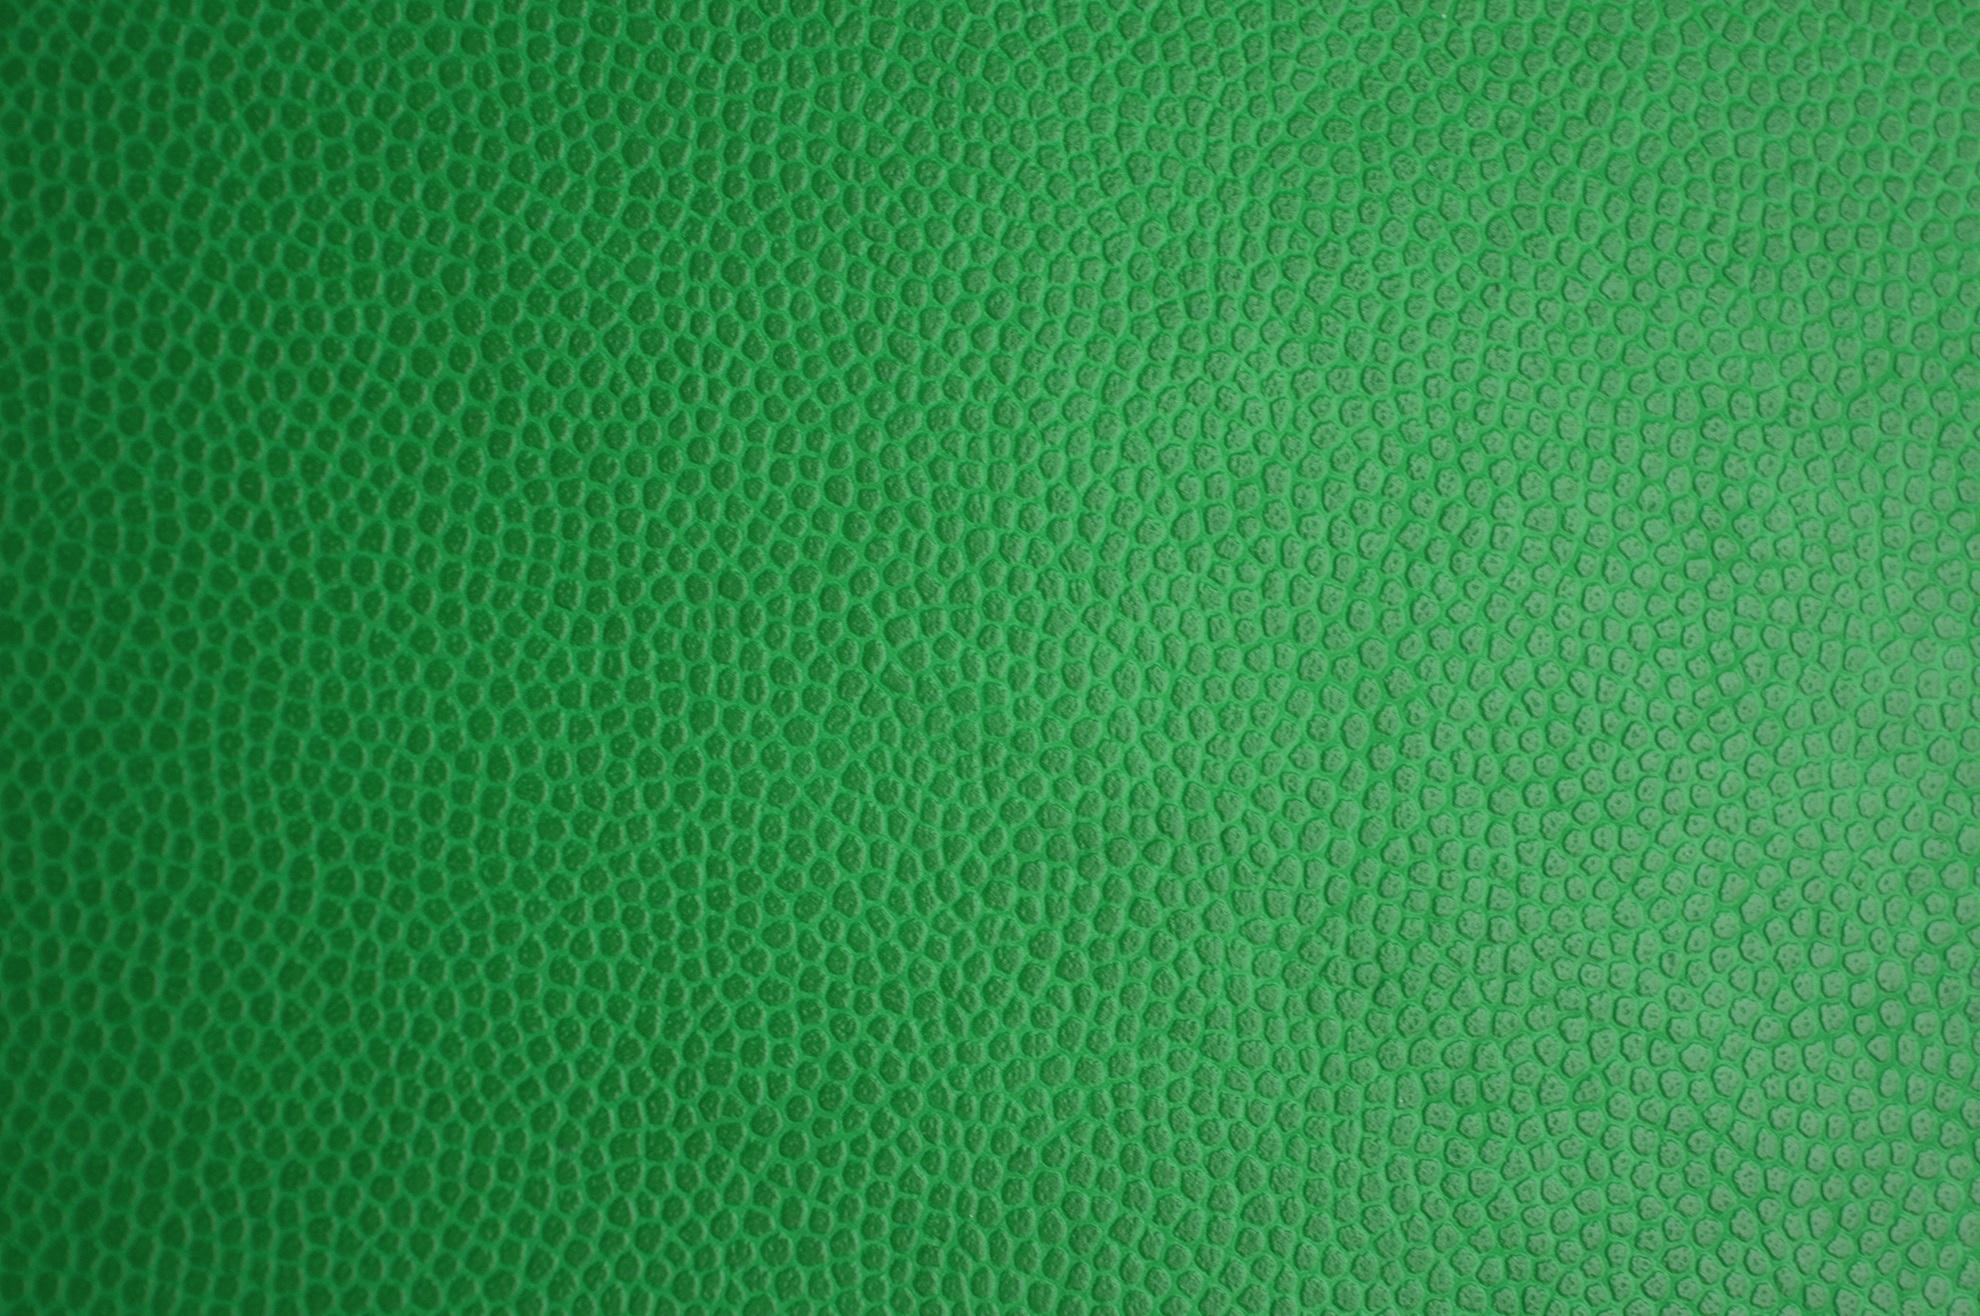 green-skin-2190694